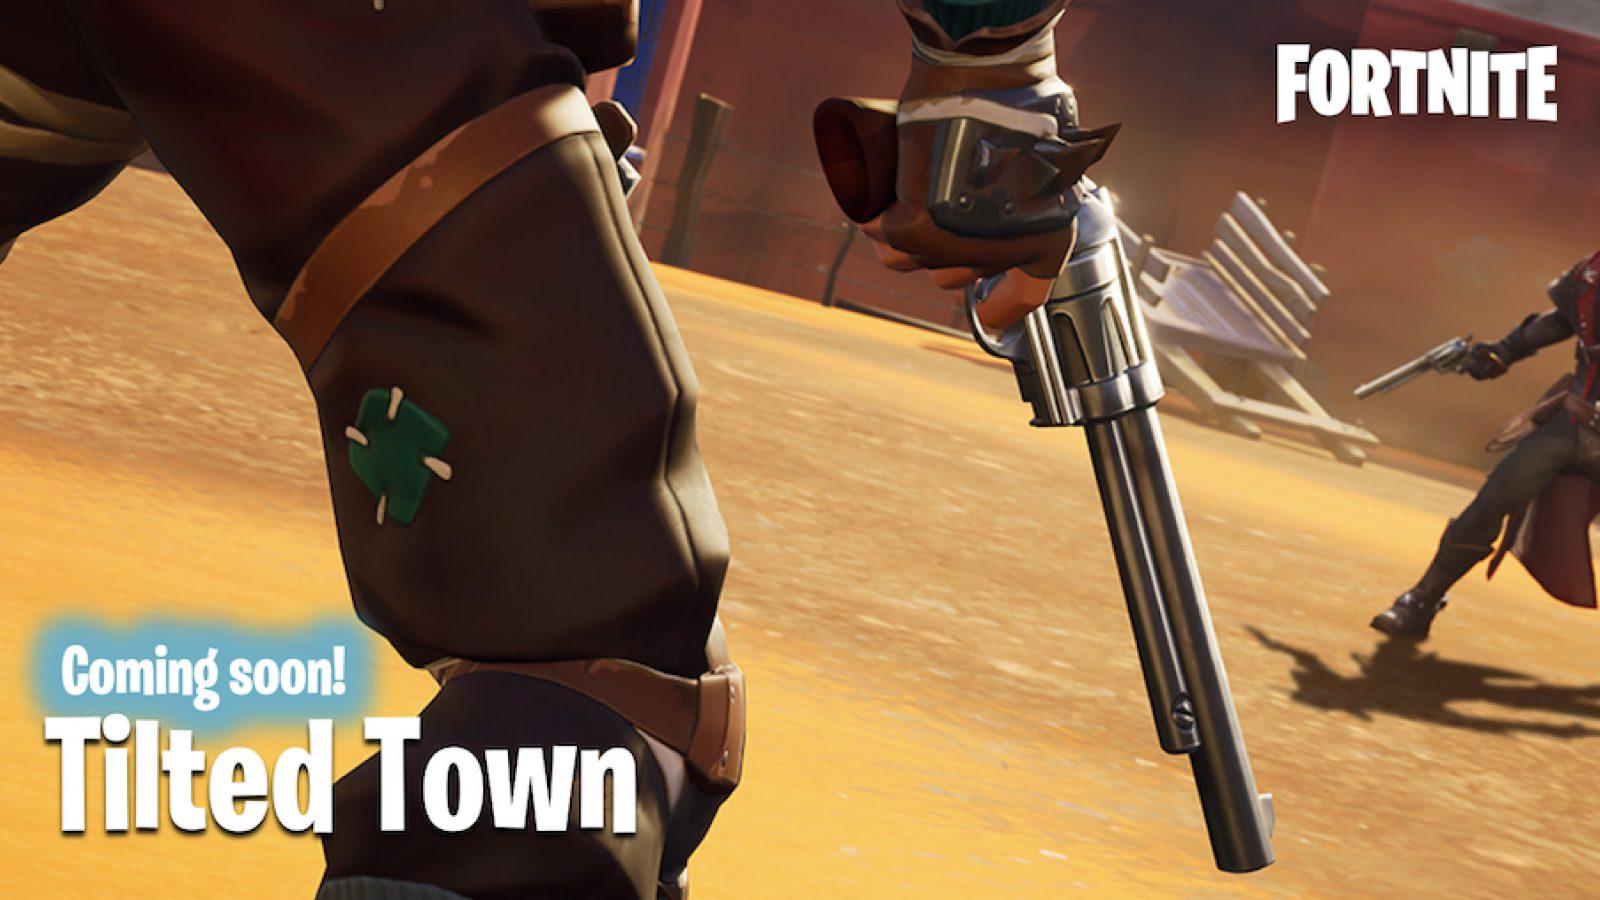 tilted-town-fortnite